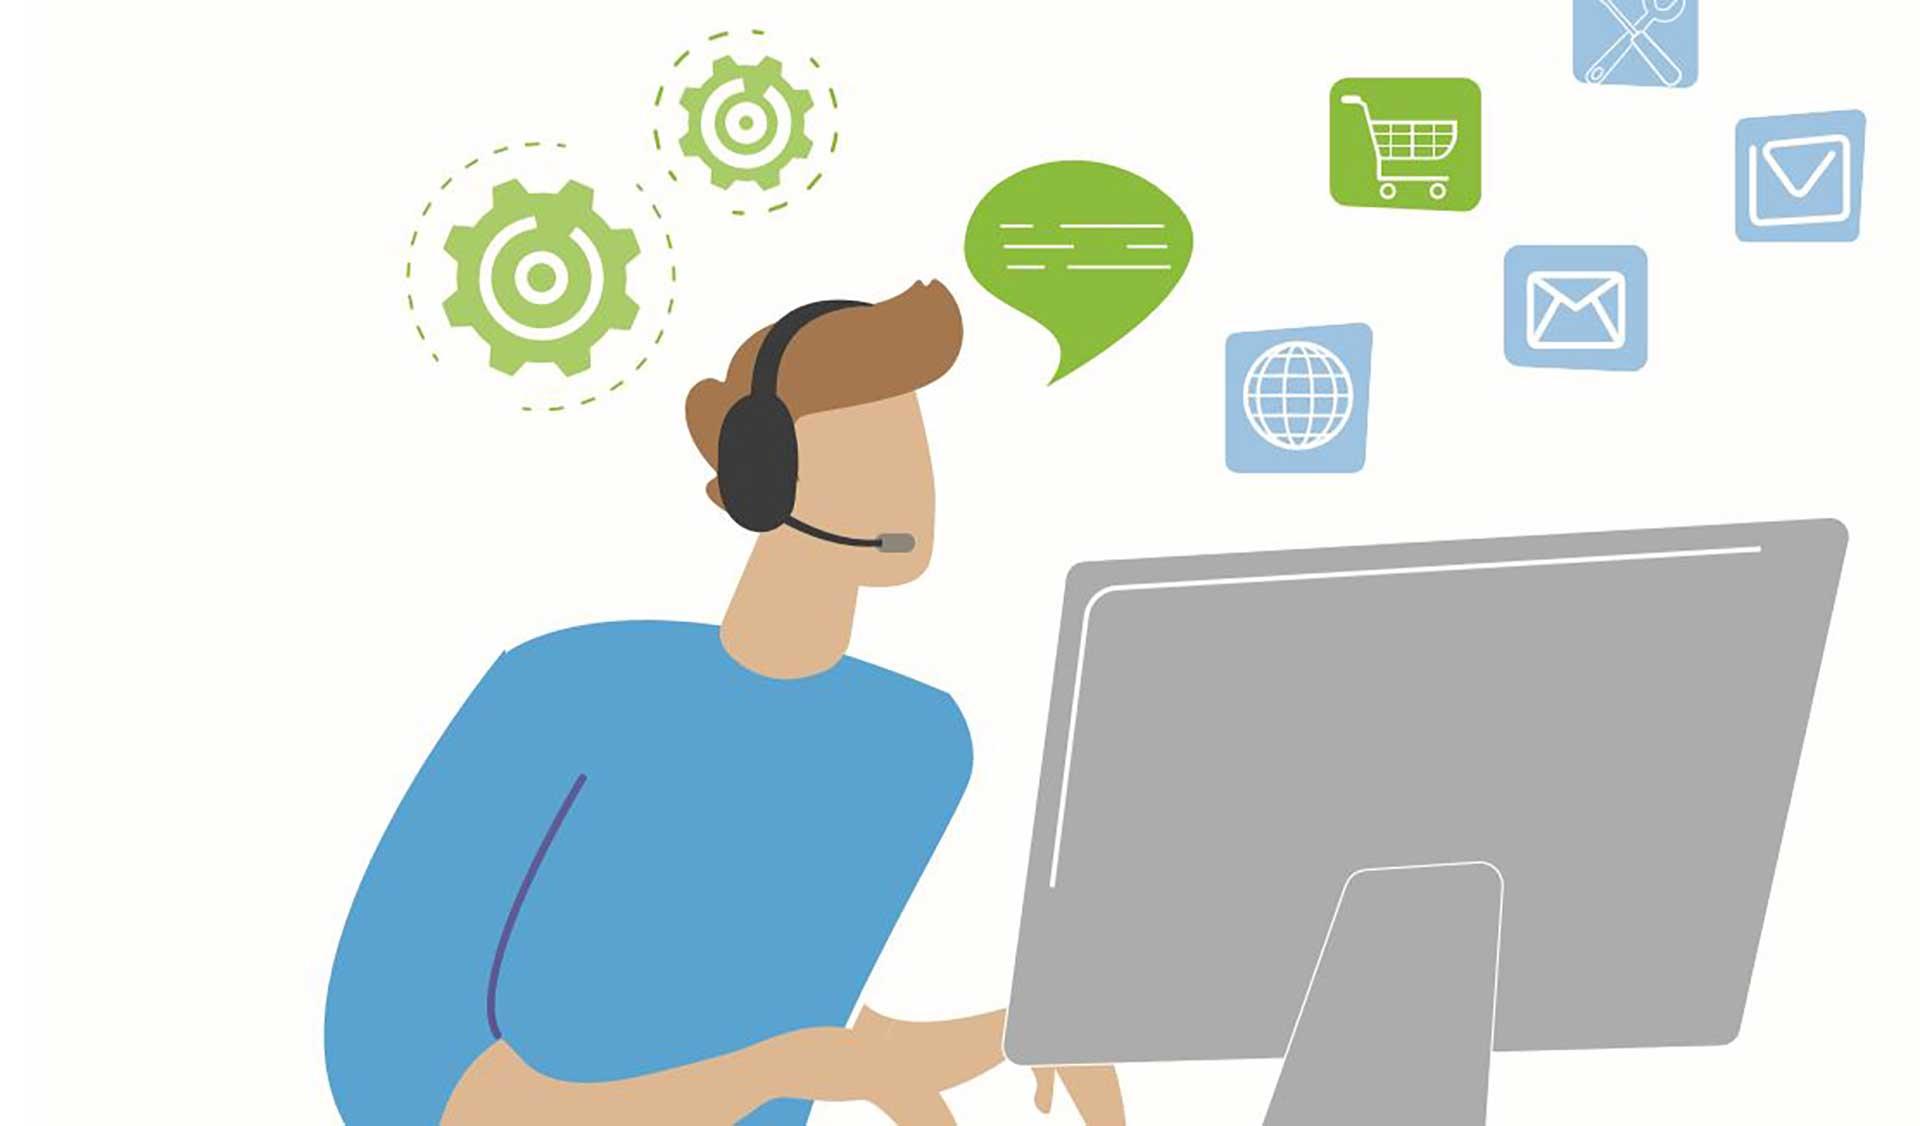 8 steps to drive customer loyalty - blog post image